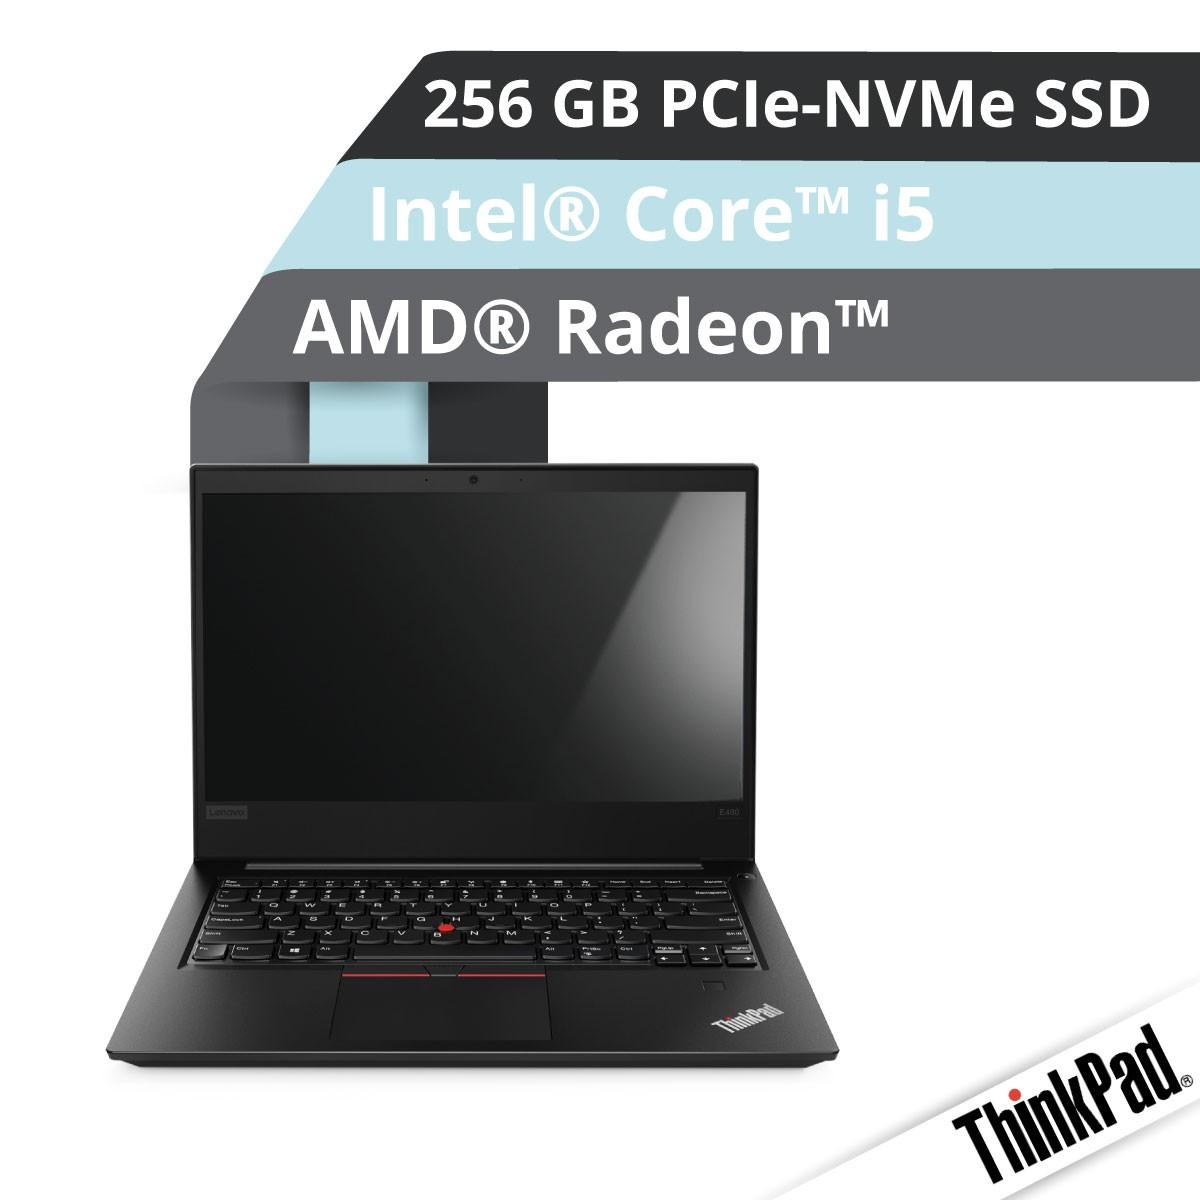 (EOL) Lenovo™ ThinkPad® E480 Notebook Modell 20KQ-S000